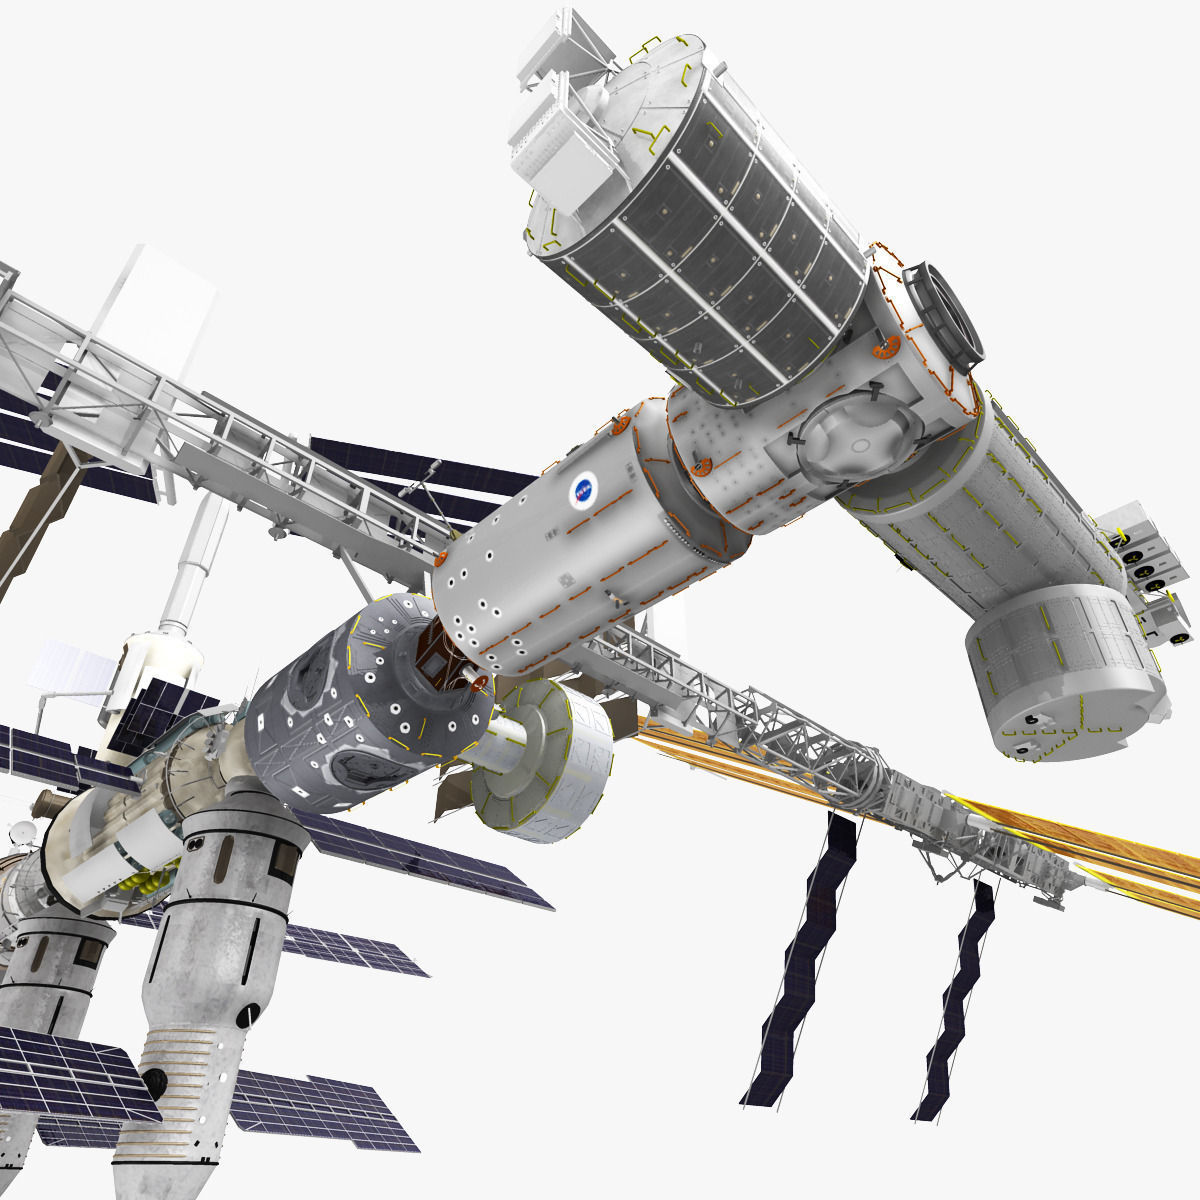 3d model international space station - photo #35